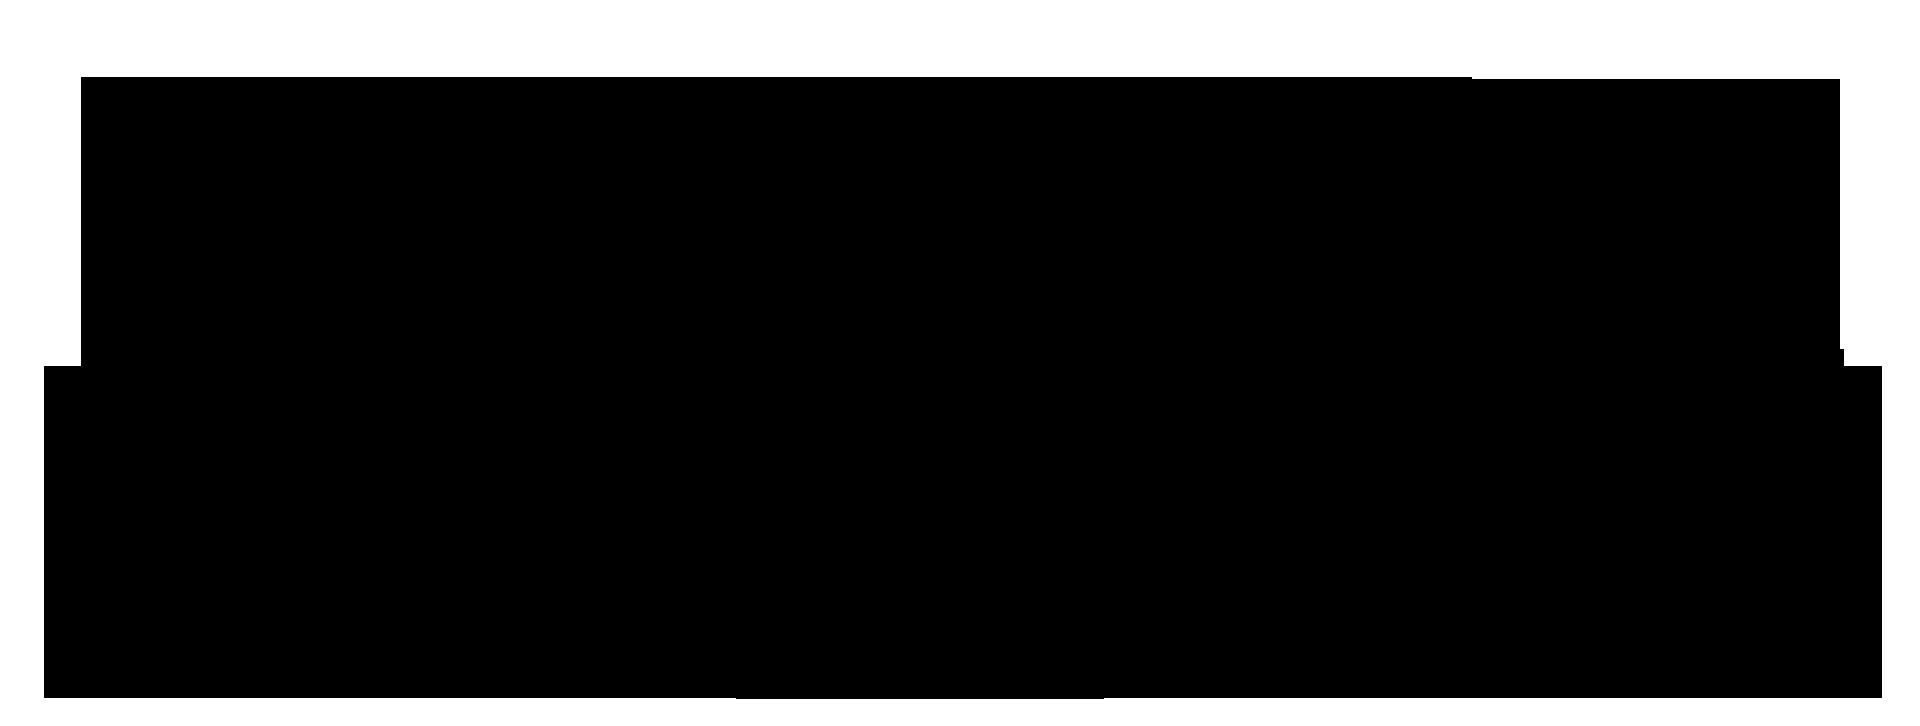 Ataraxia-mgmt